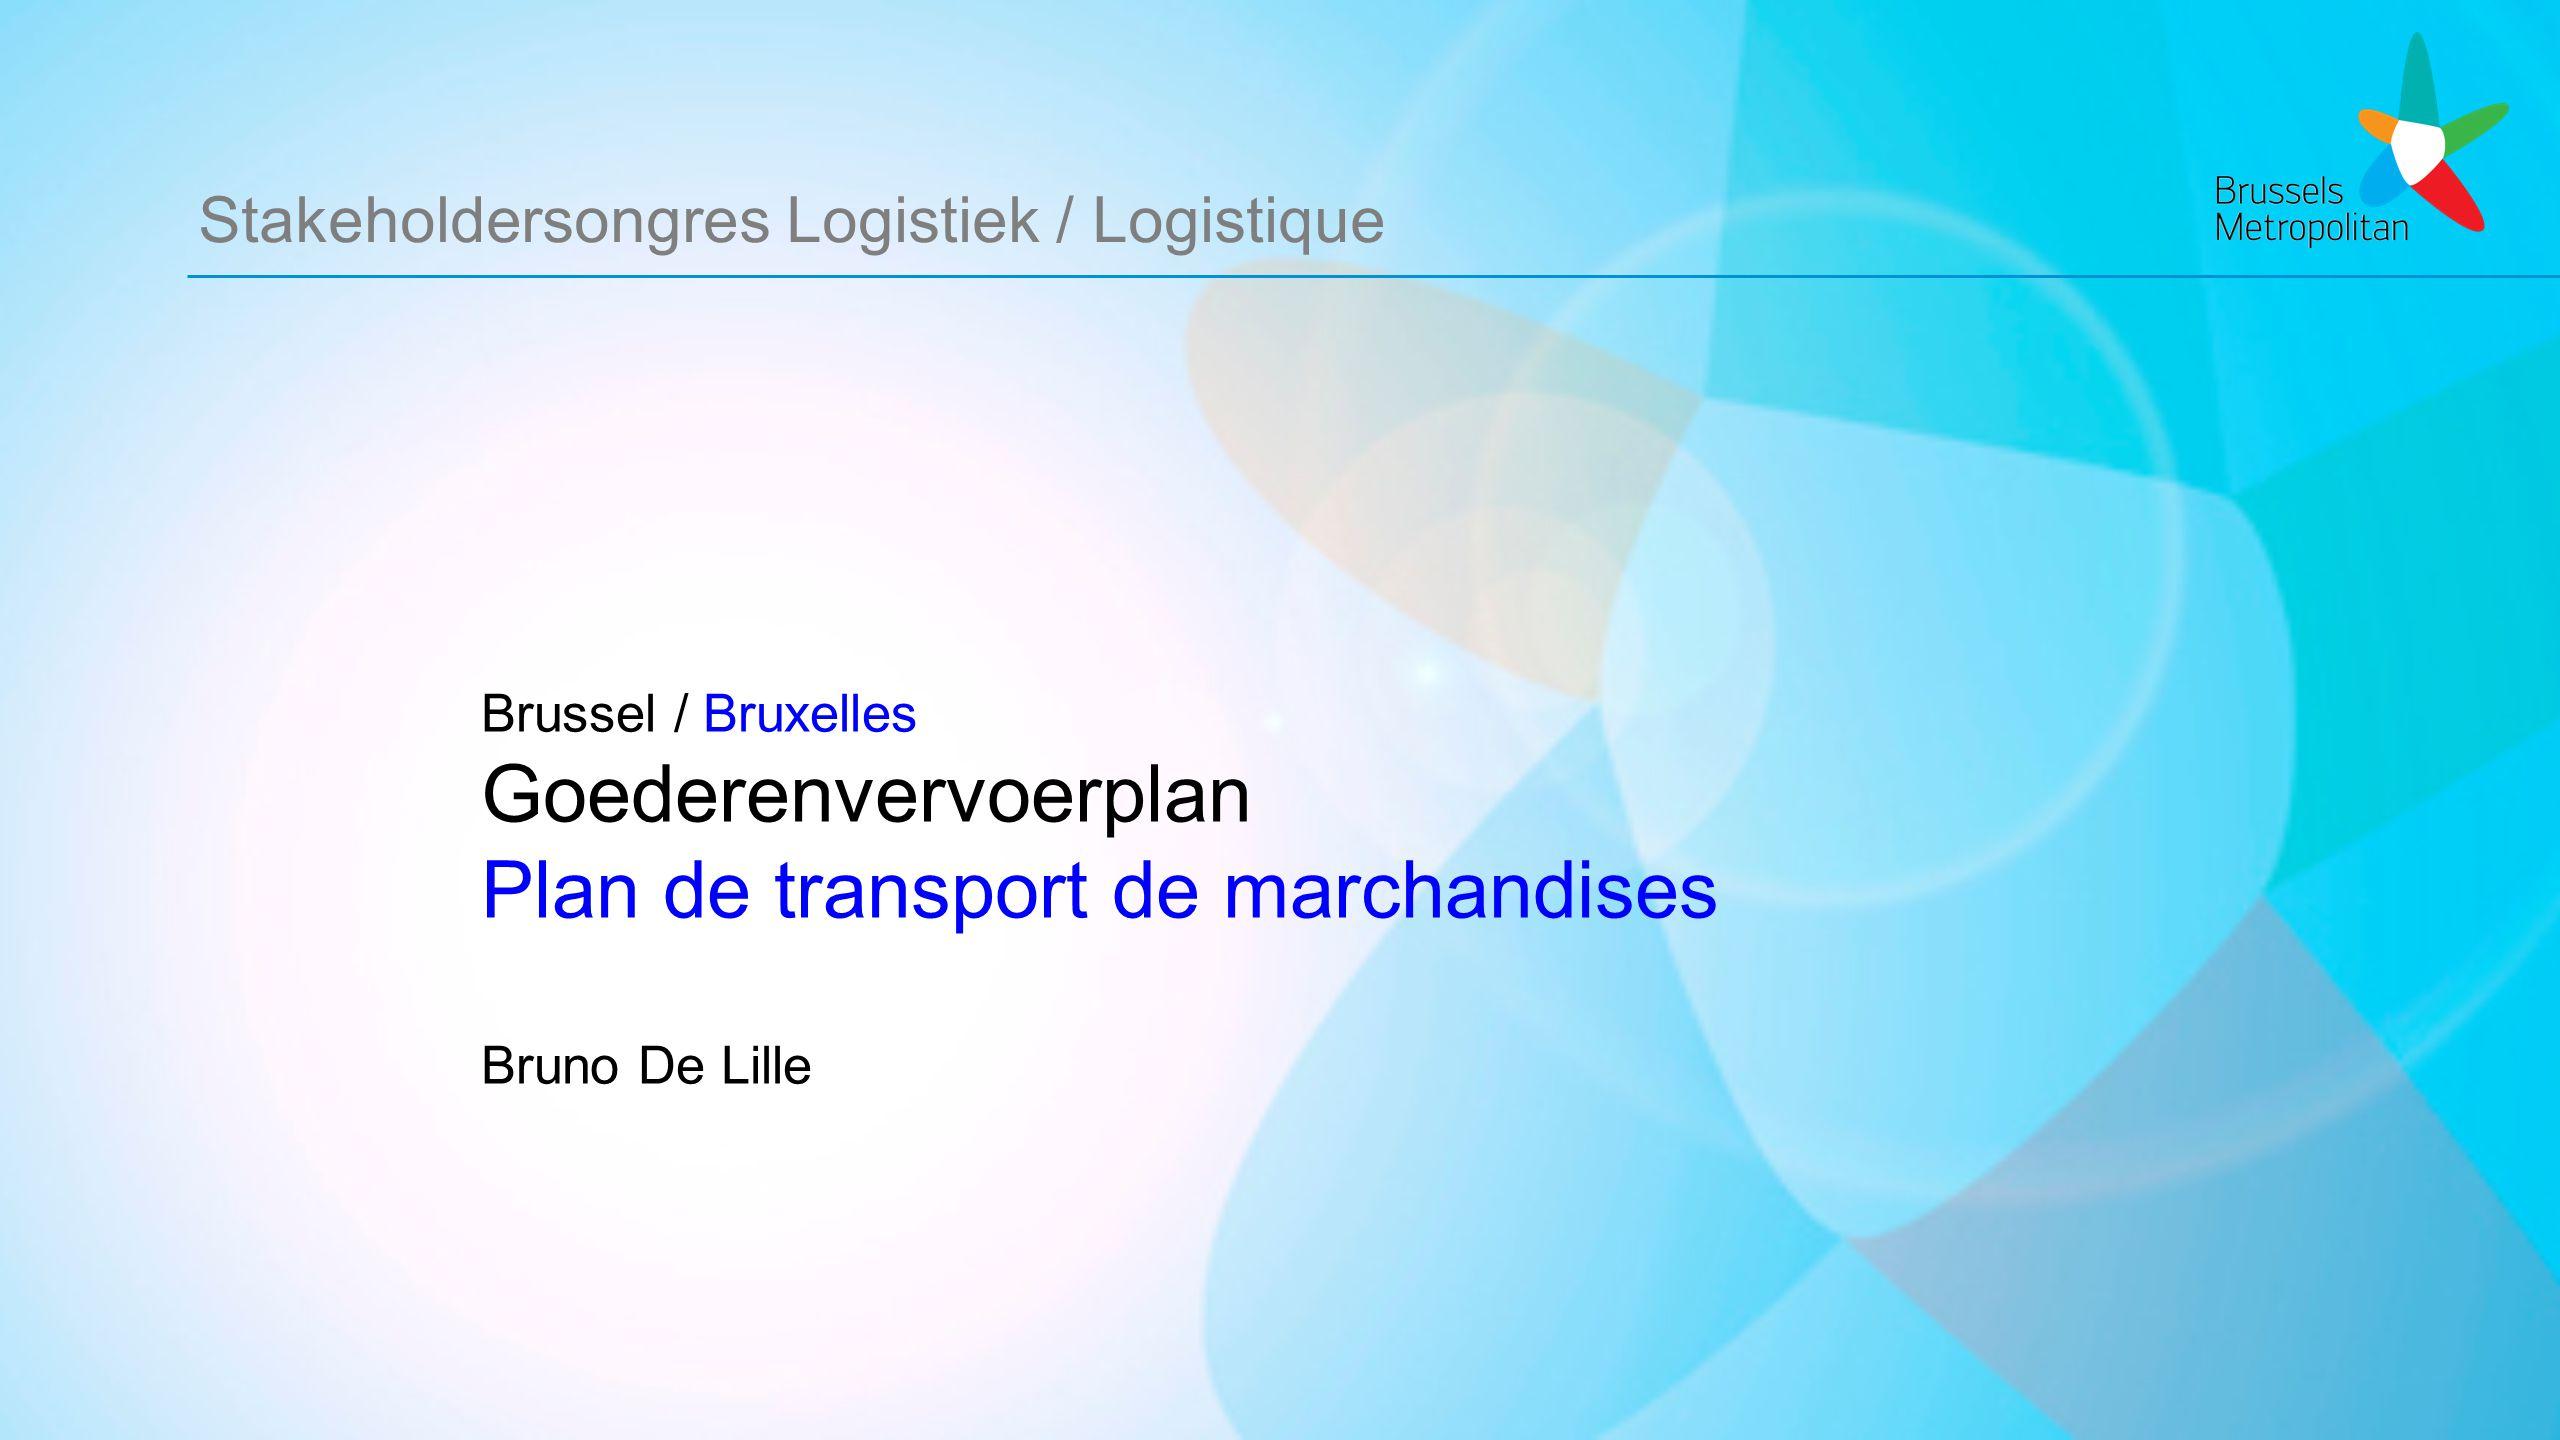 Stakeholdersongres Logistiek / Logistique Brussel / Bruxelles Goederenvervoerplan Plan de transport de marchandises Bruno De Lille